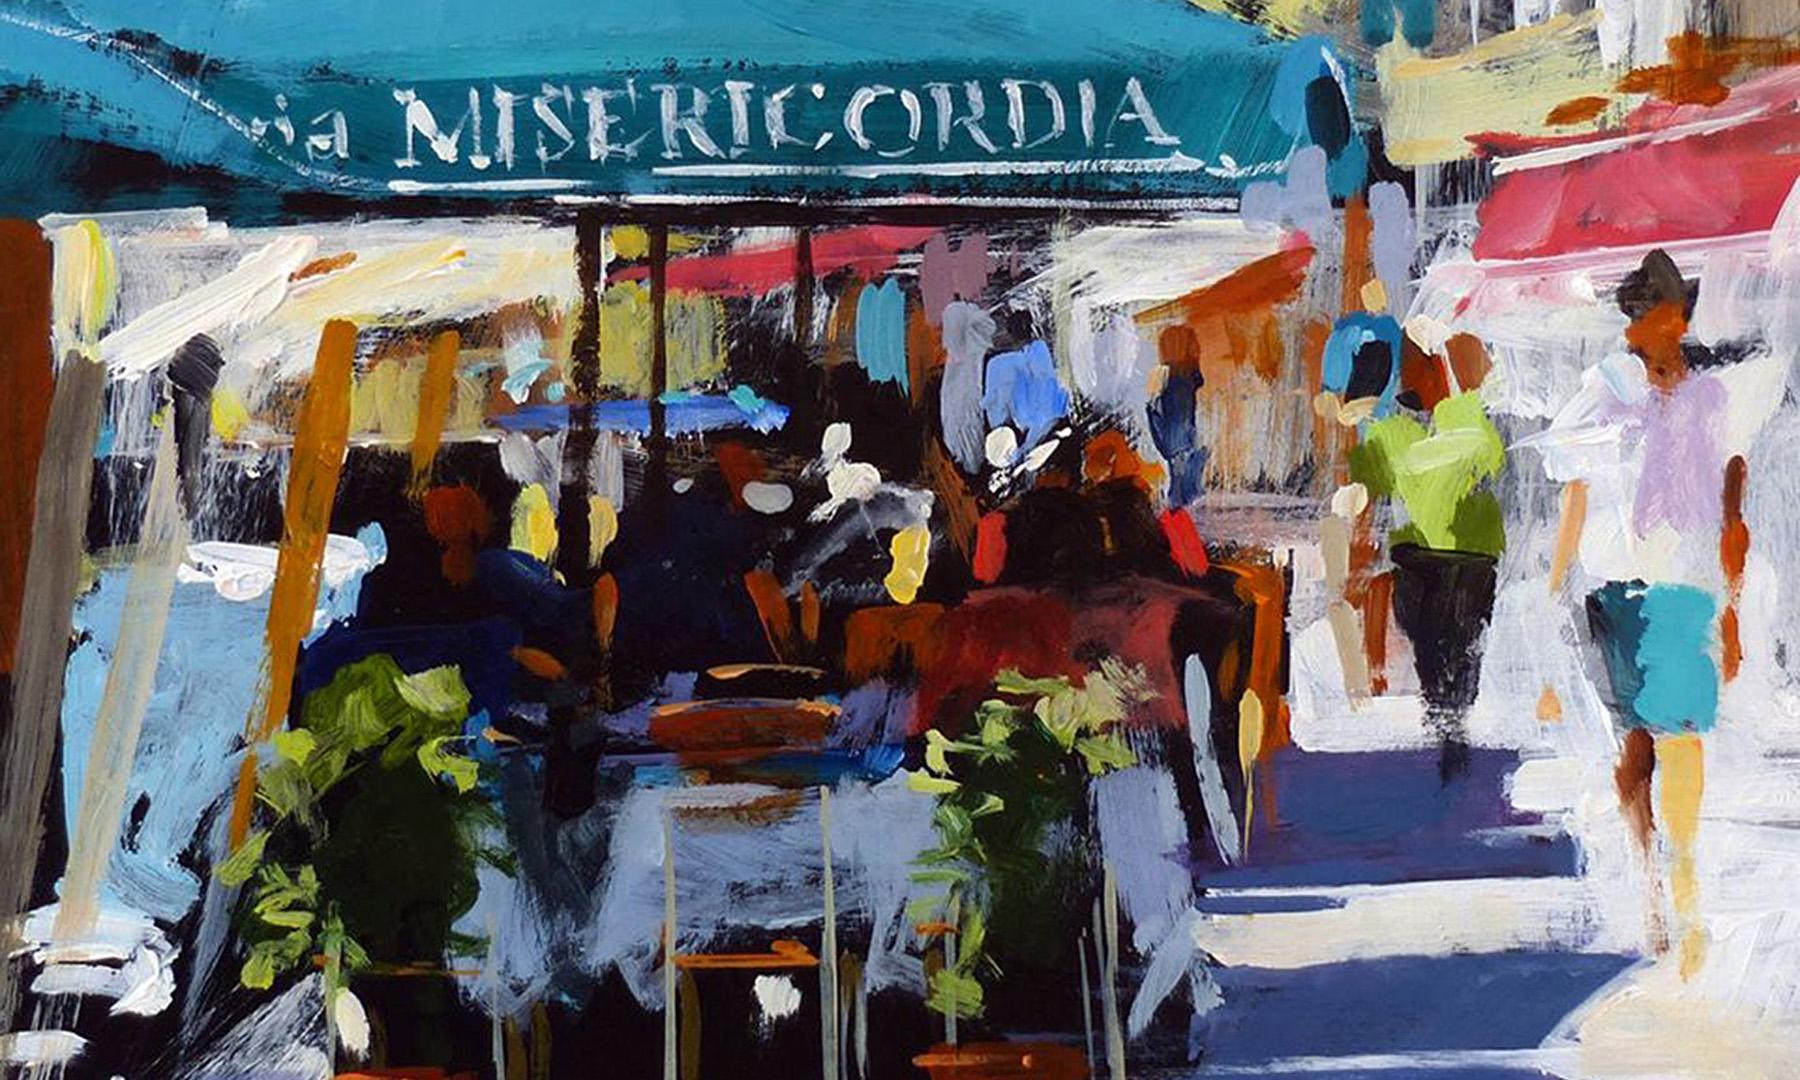 Trattoria Misericordia - Venezia